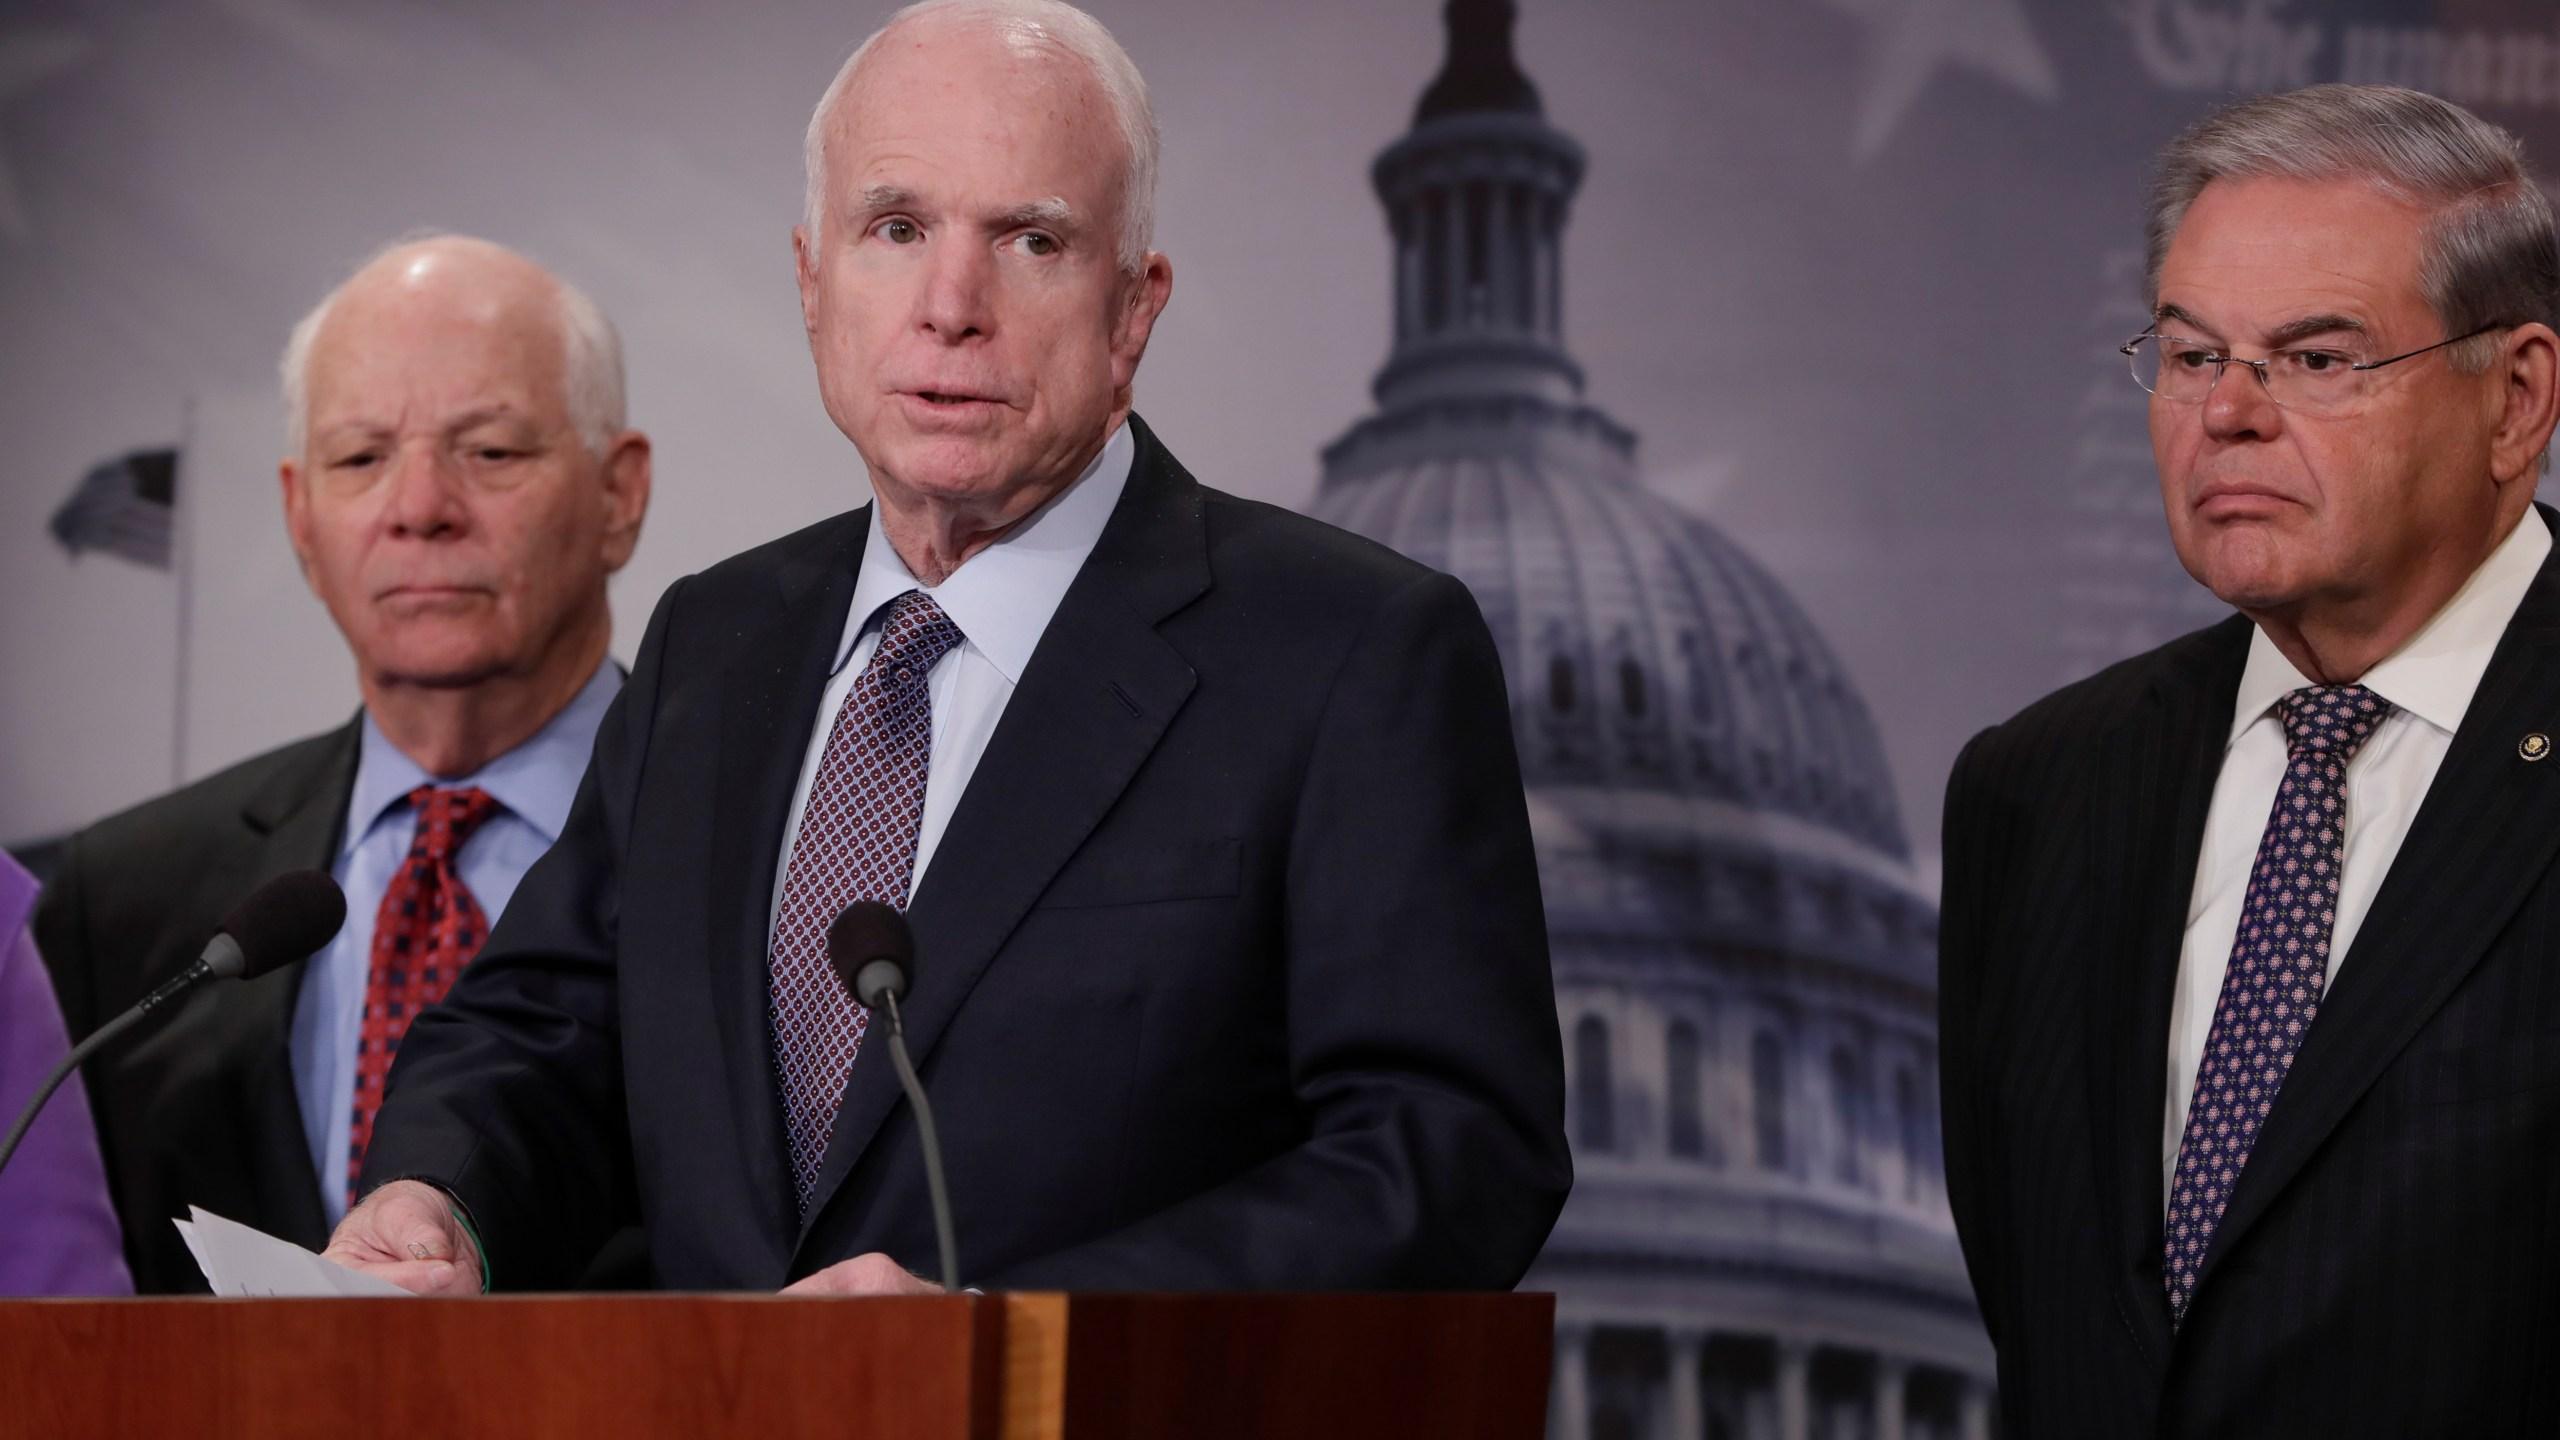 John McCain, Ben Cardin, Bob Menendez 01102017 Photo by J. Scott Applewhite, AP Photo_264417